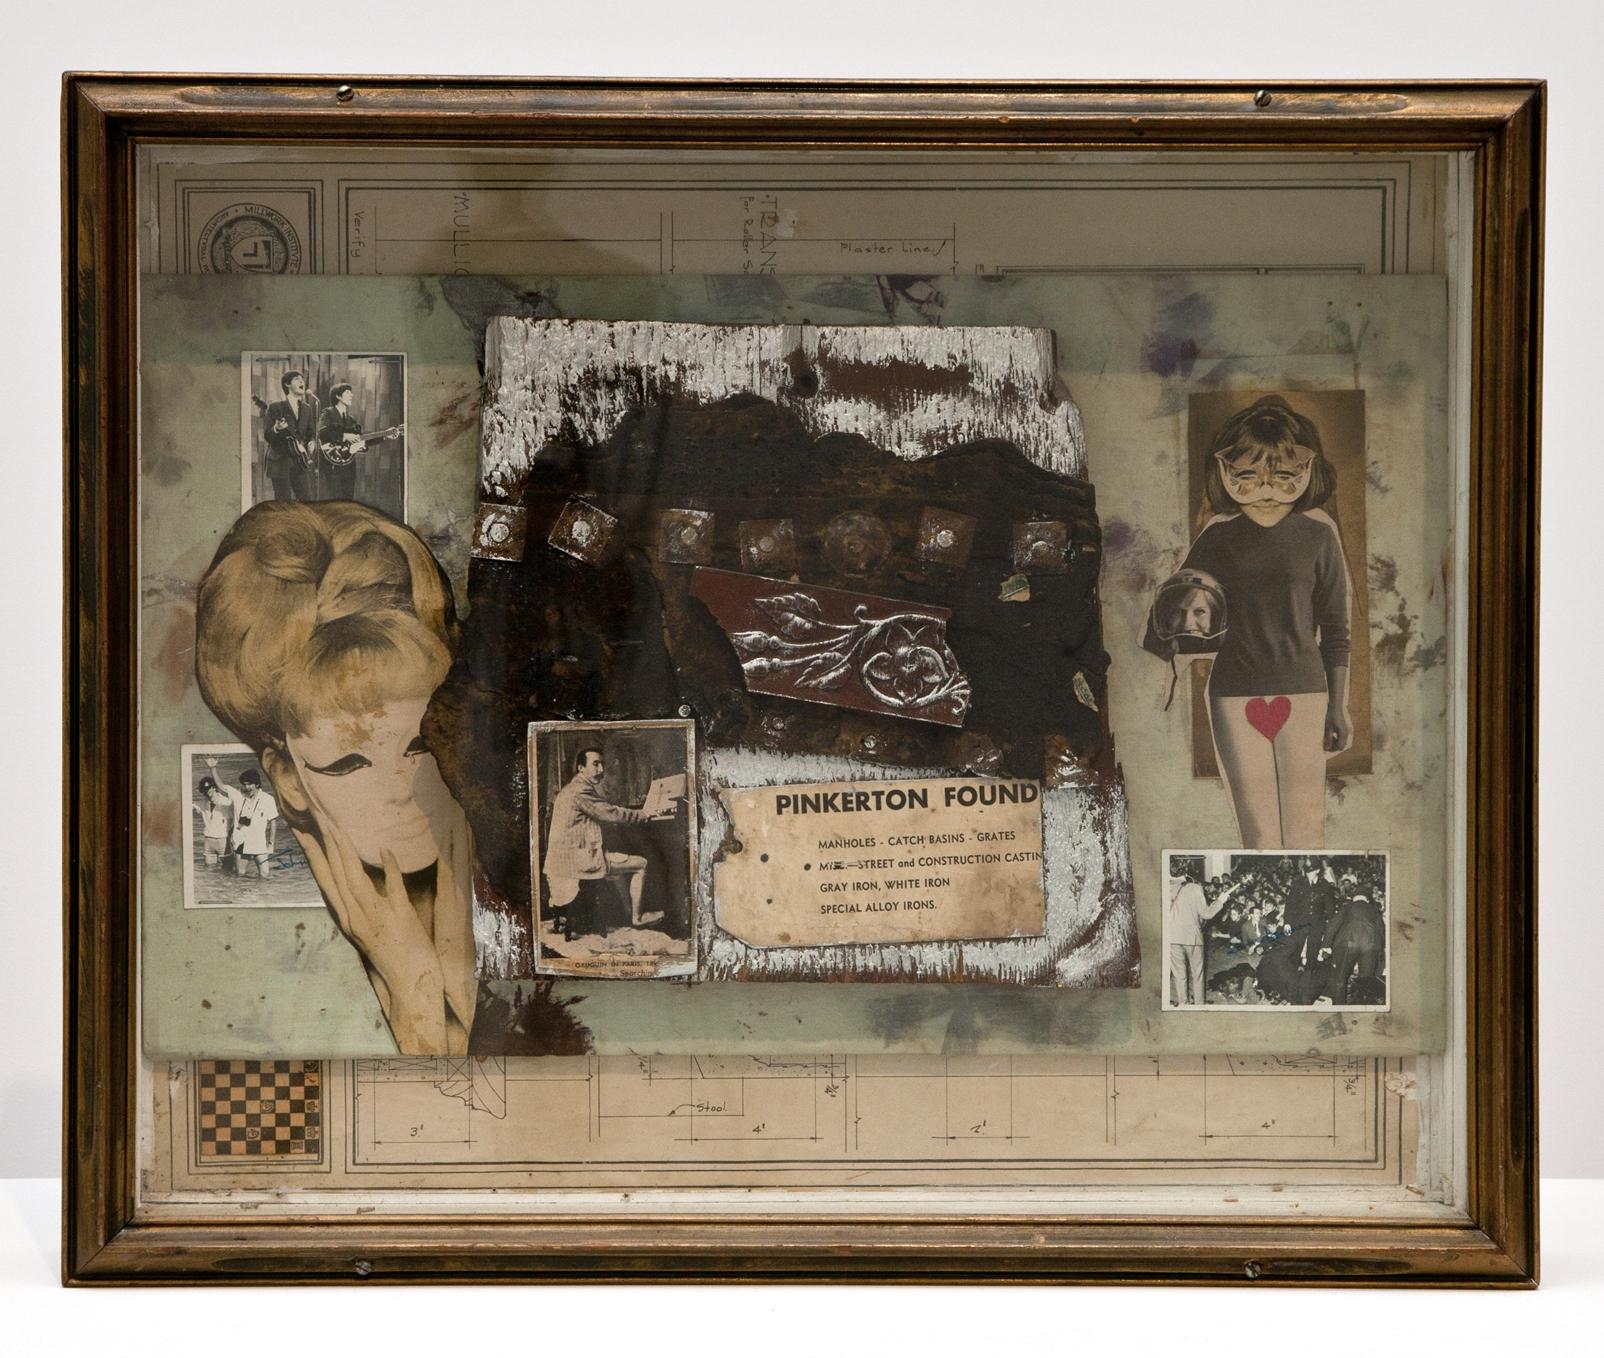 Lawrence Jordan, PINKERTON FOUND, 1966, collage, 17 3/4 x 21 3/4 x 4 1/2 inches